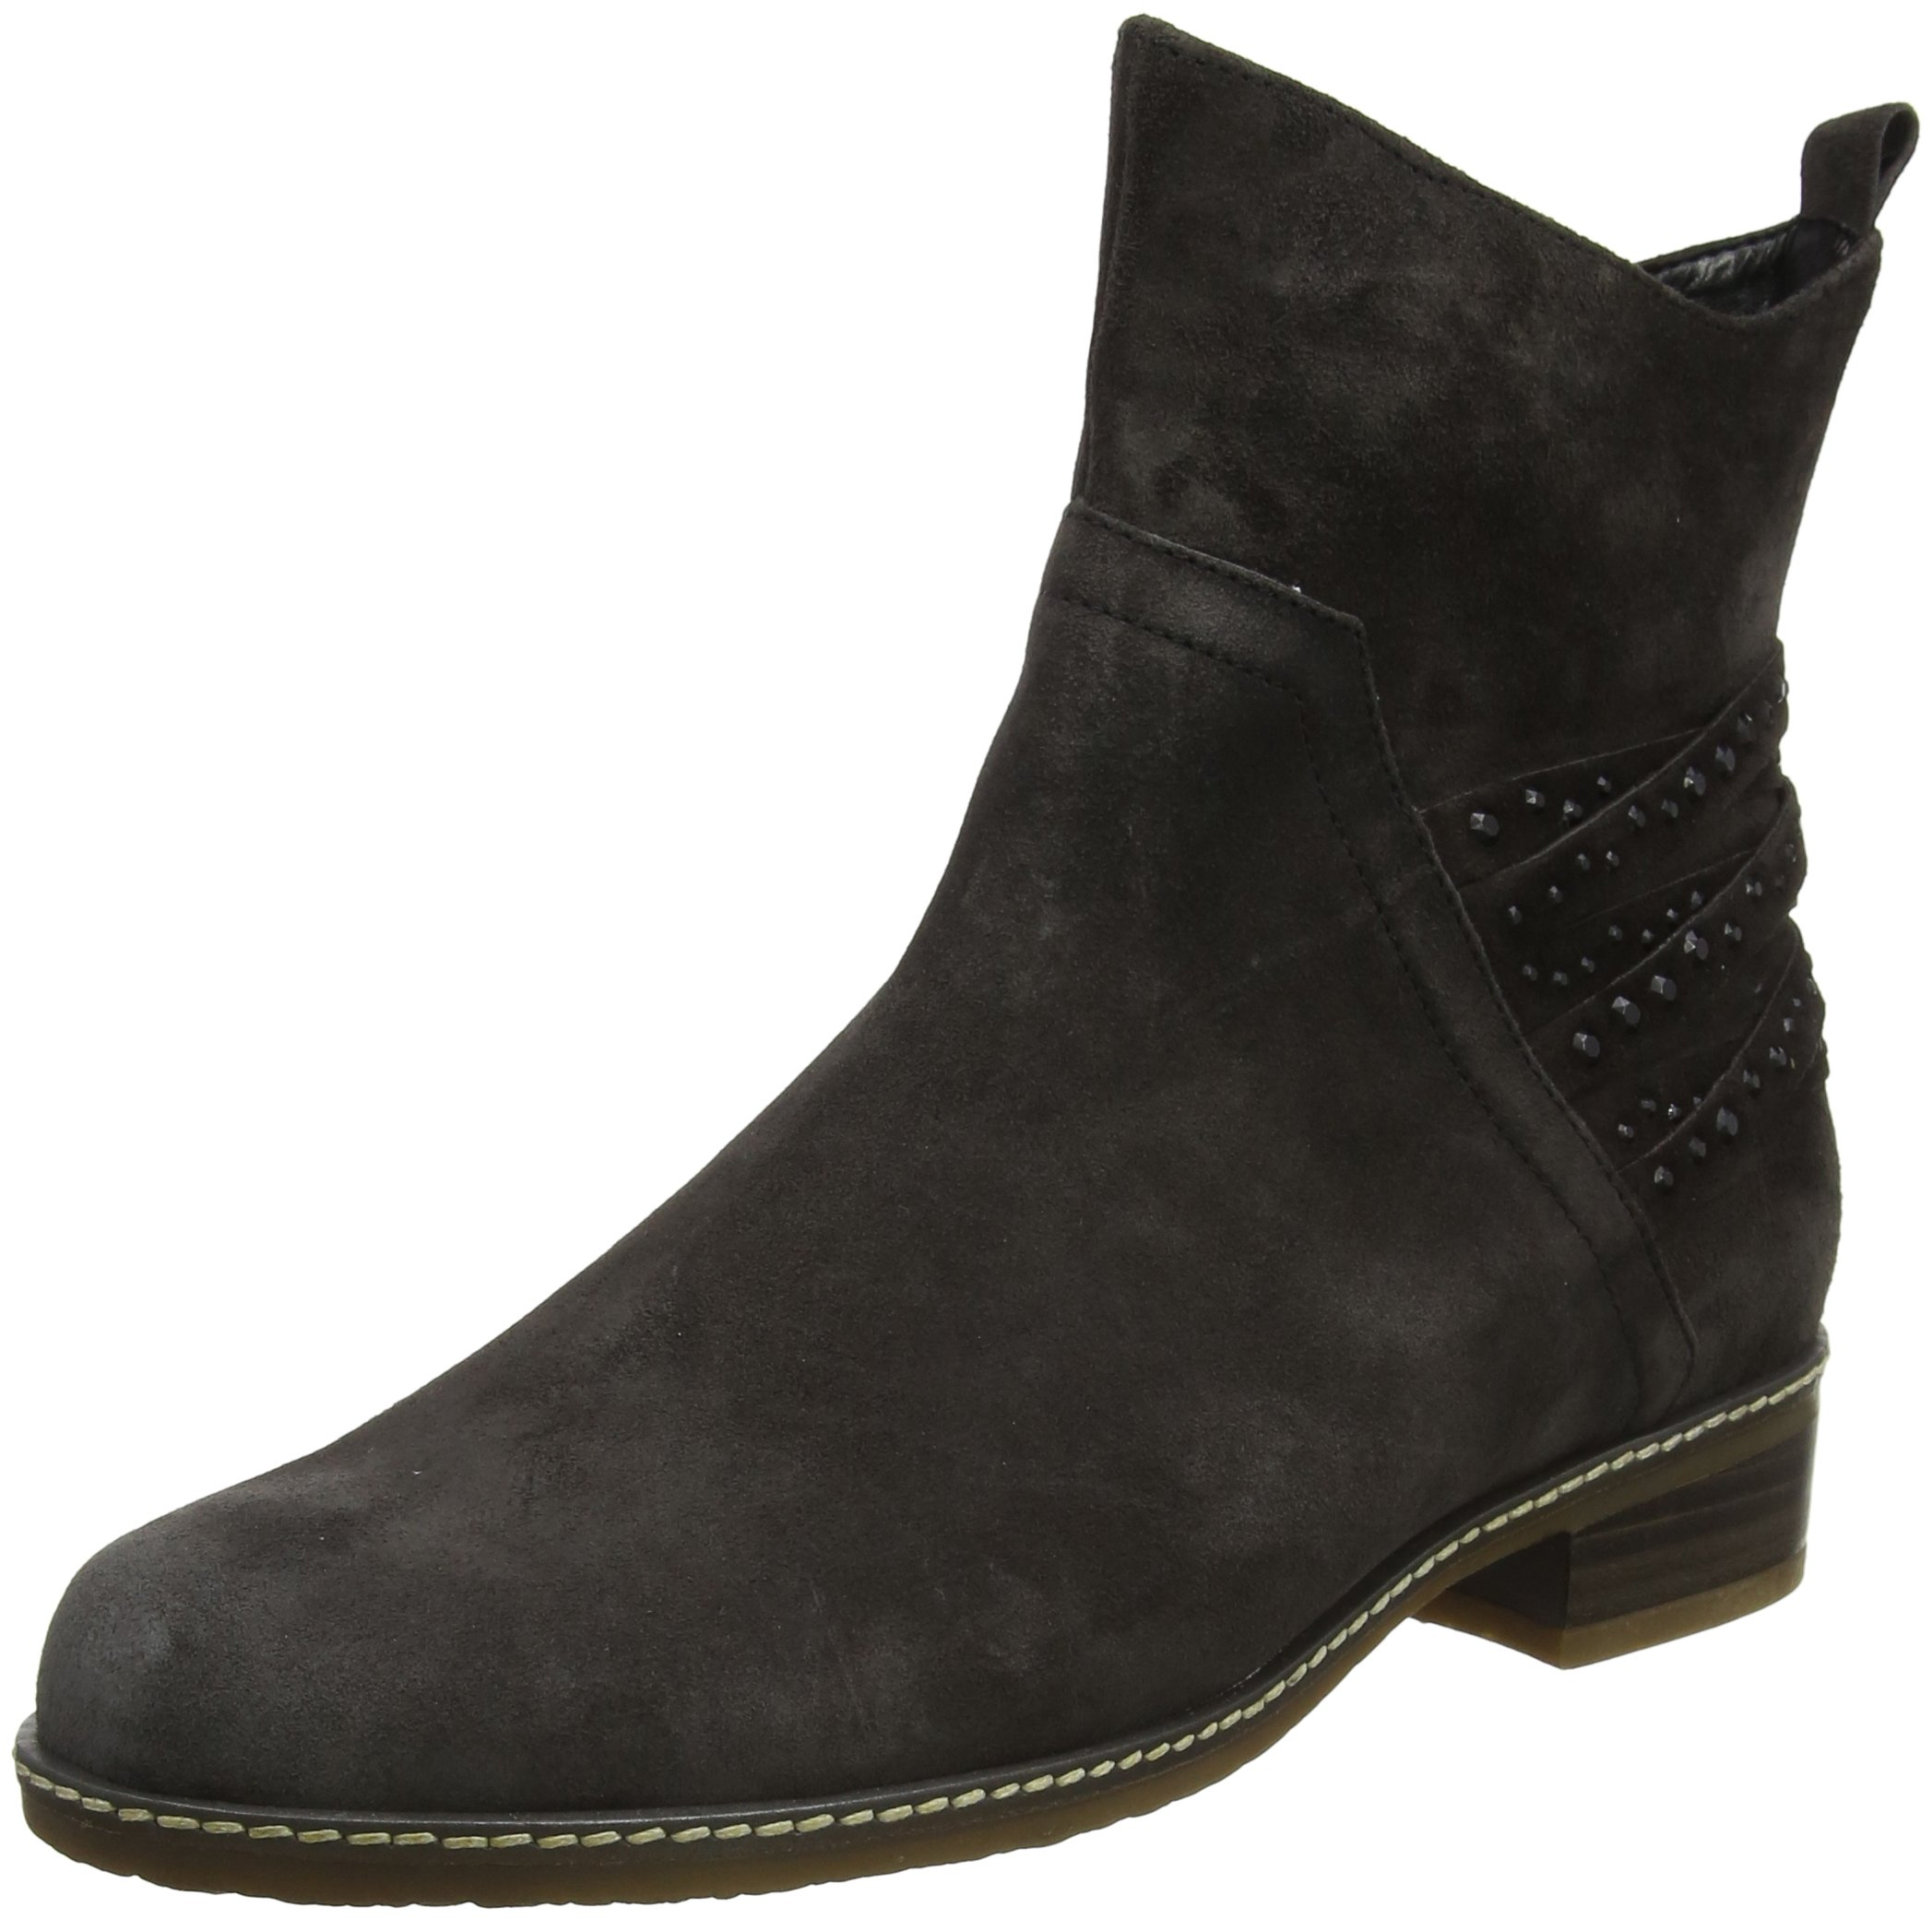 Gabor Micro40 SportBottes Eu Shoes Comfort FemmeGris39 Dark grey 5 Tc1lFJ35uK